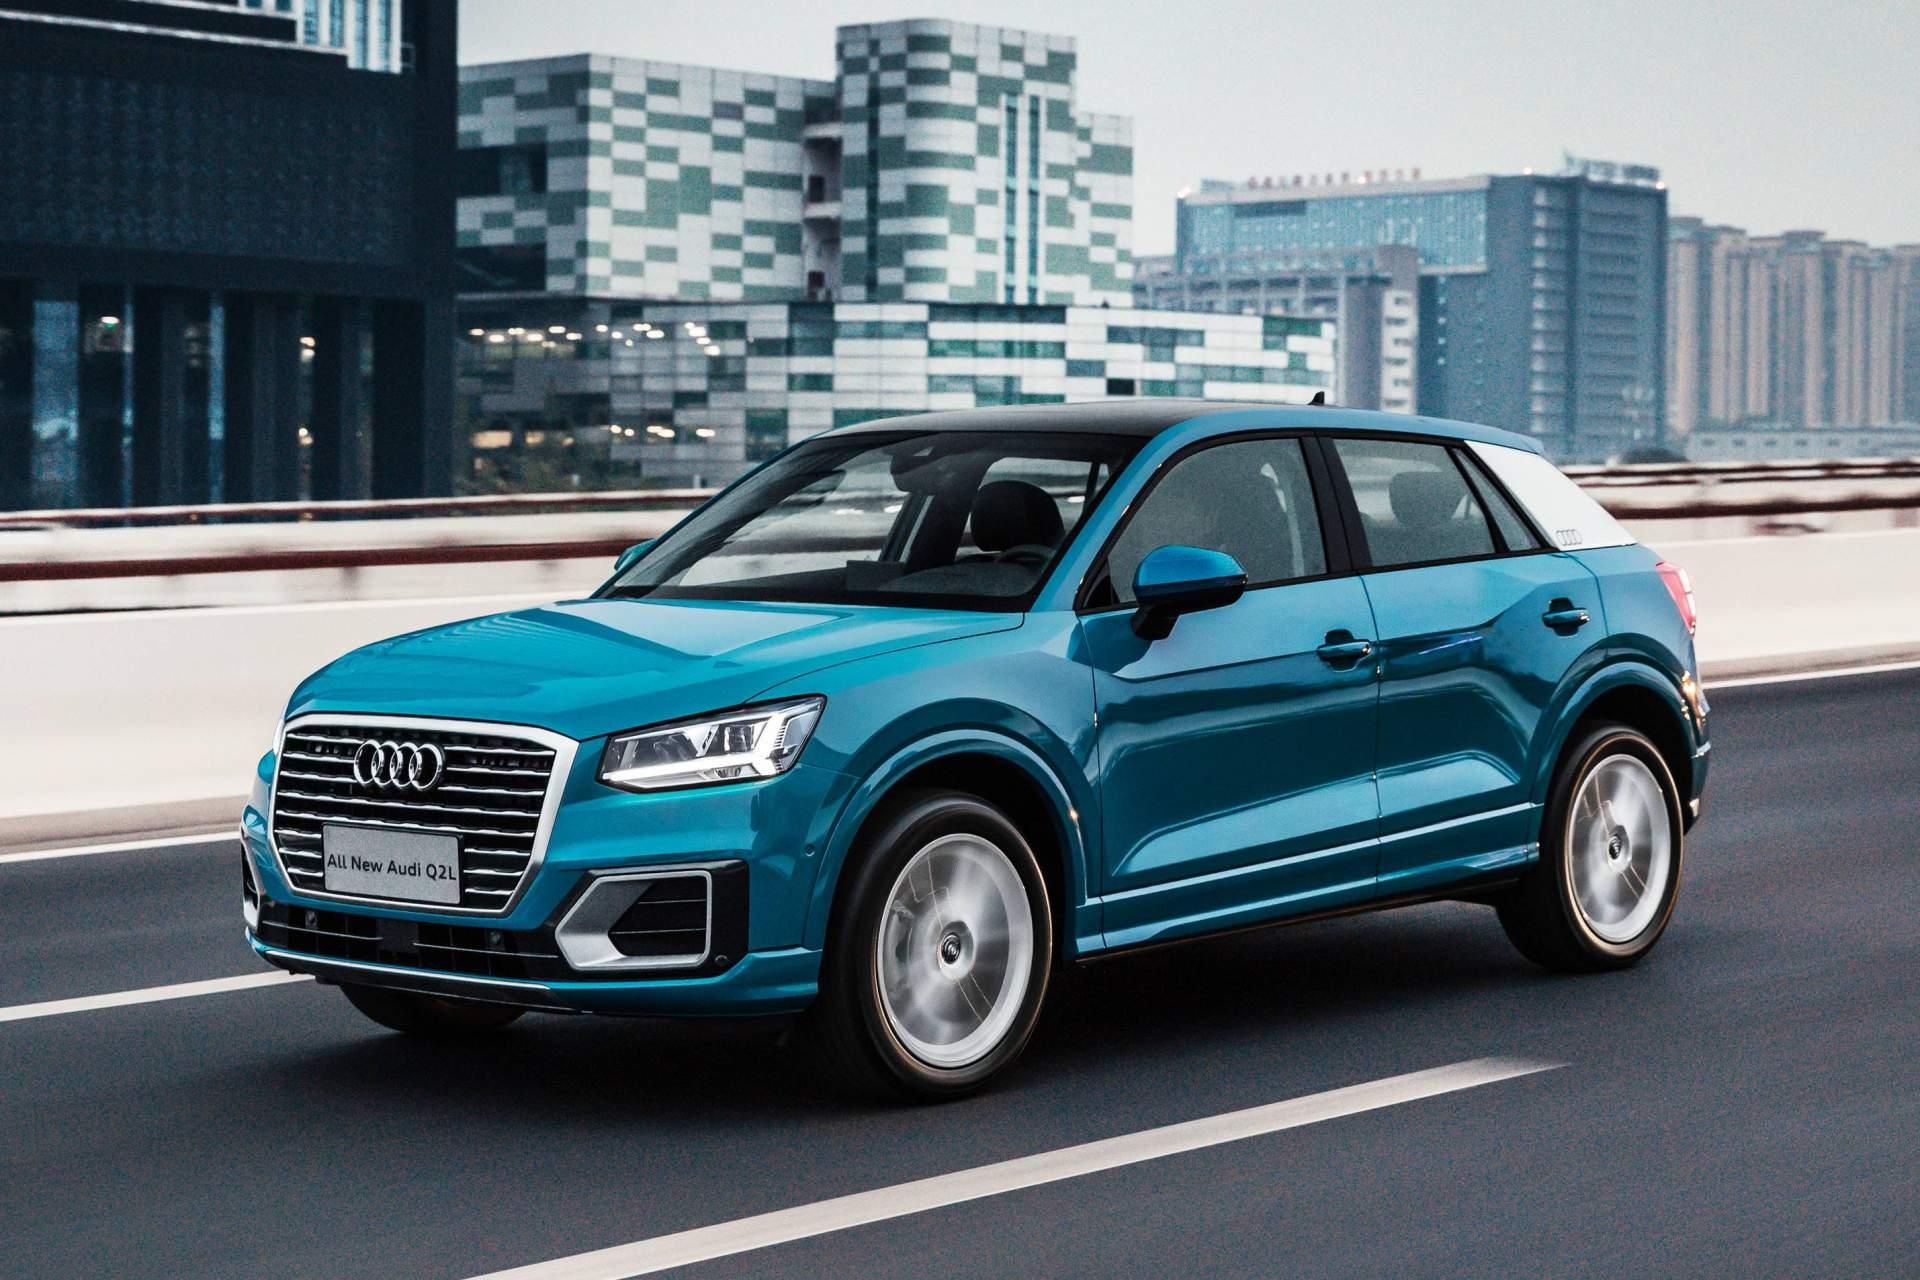 Audi_Q2_L_0003